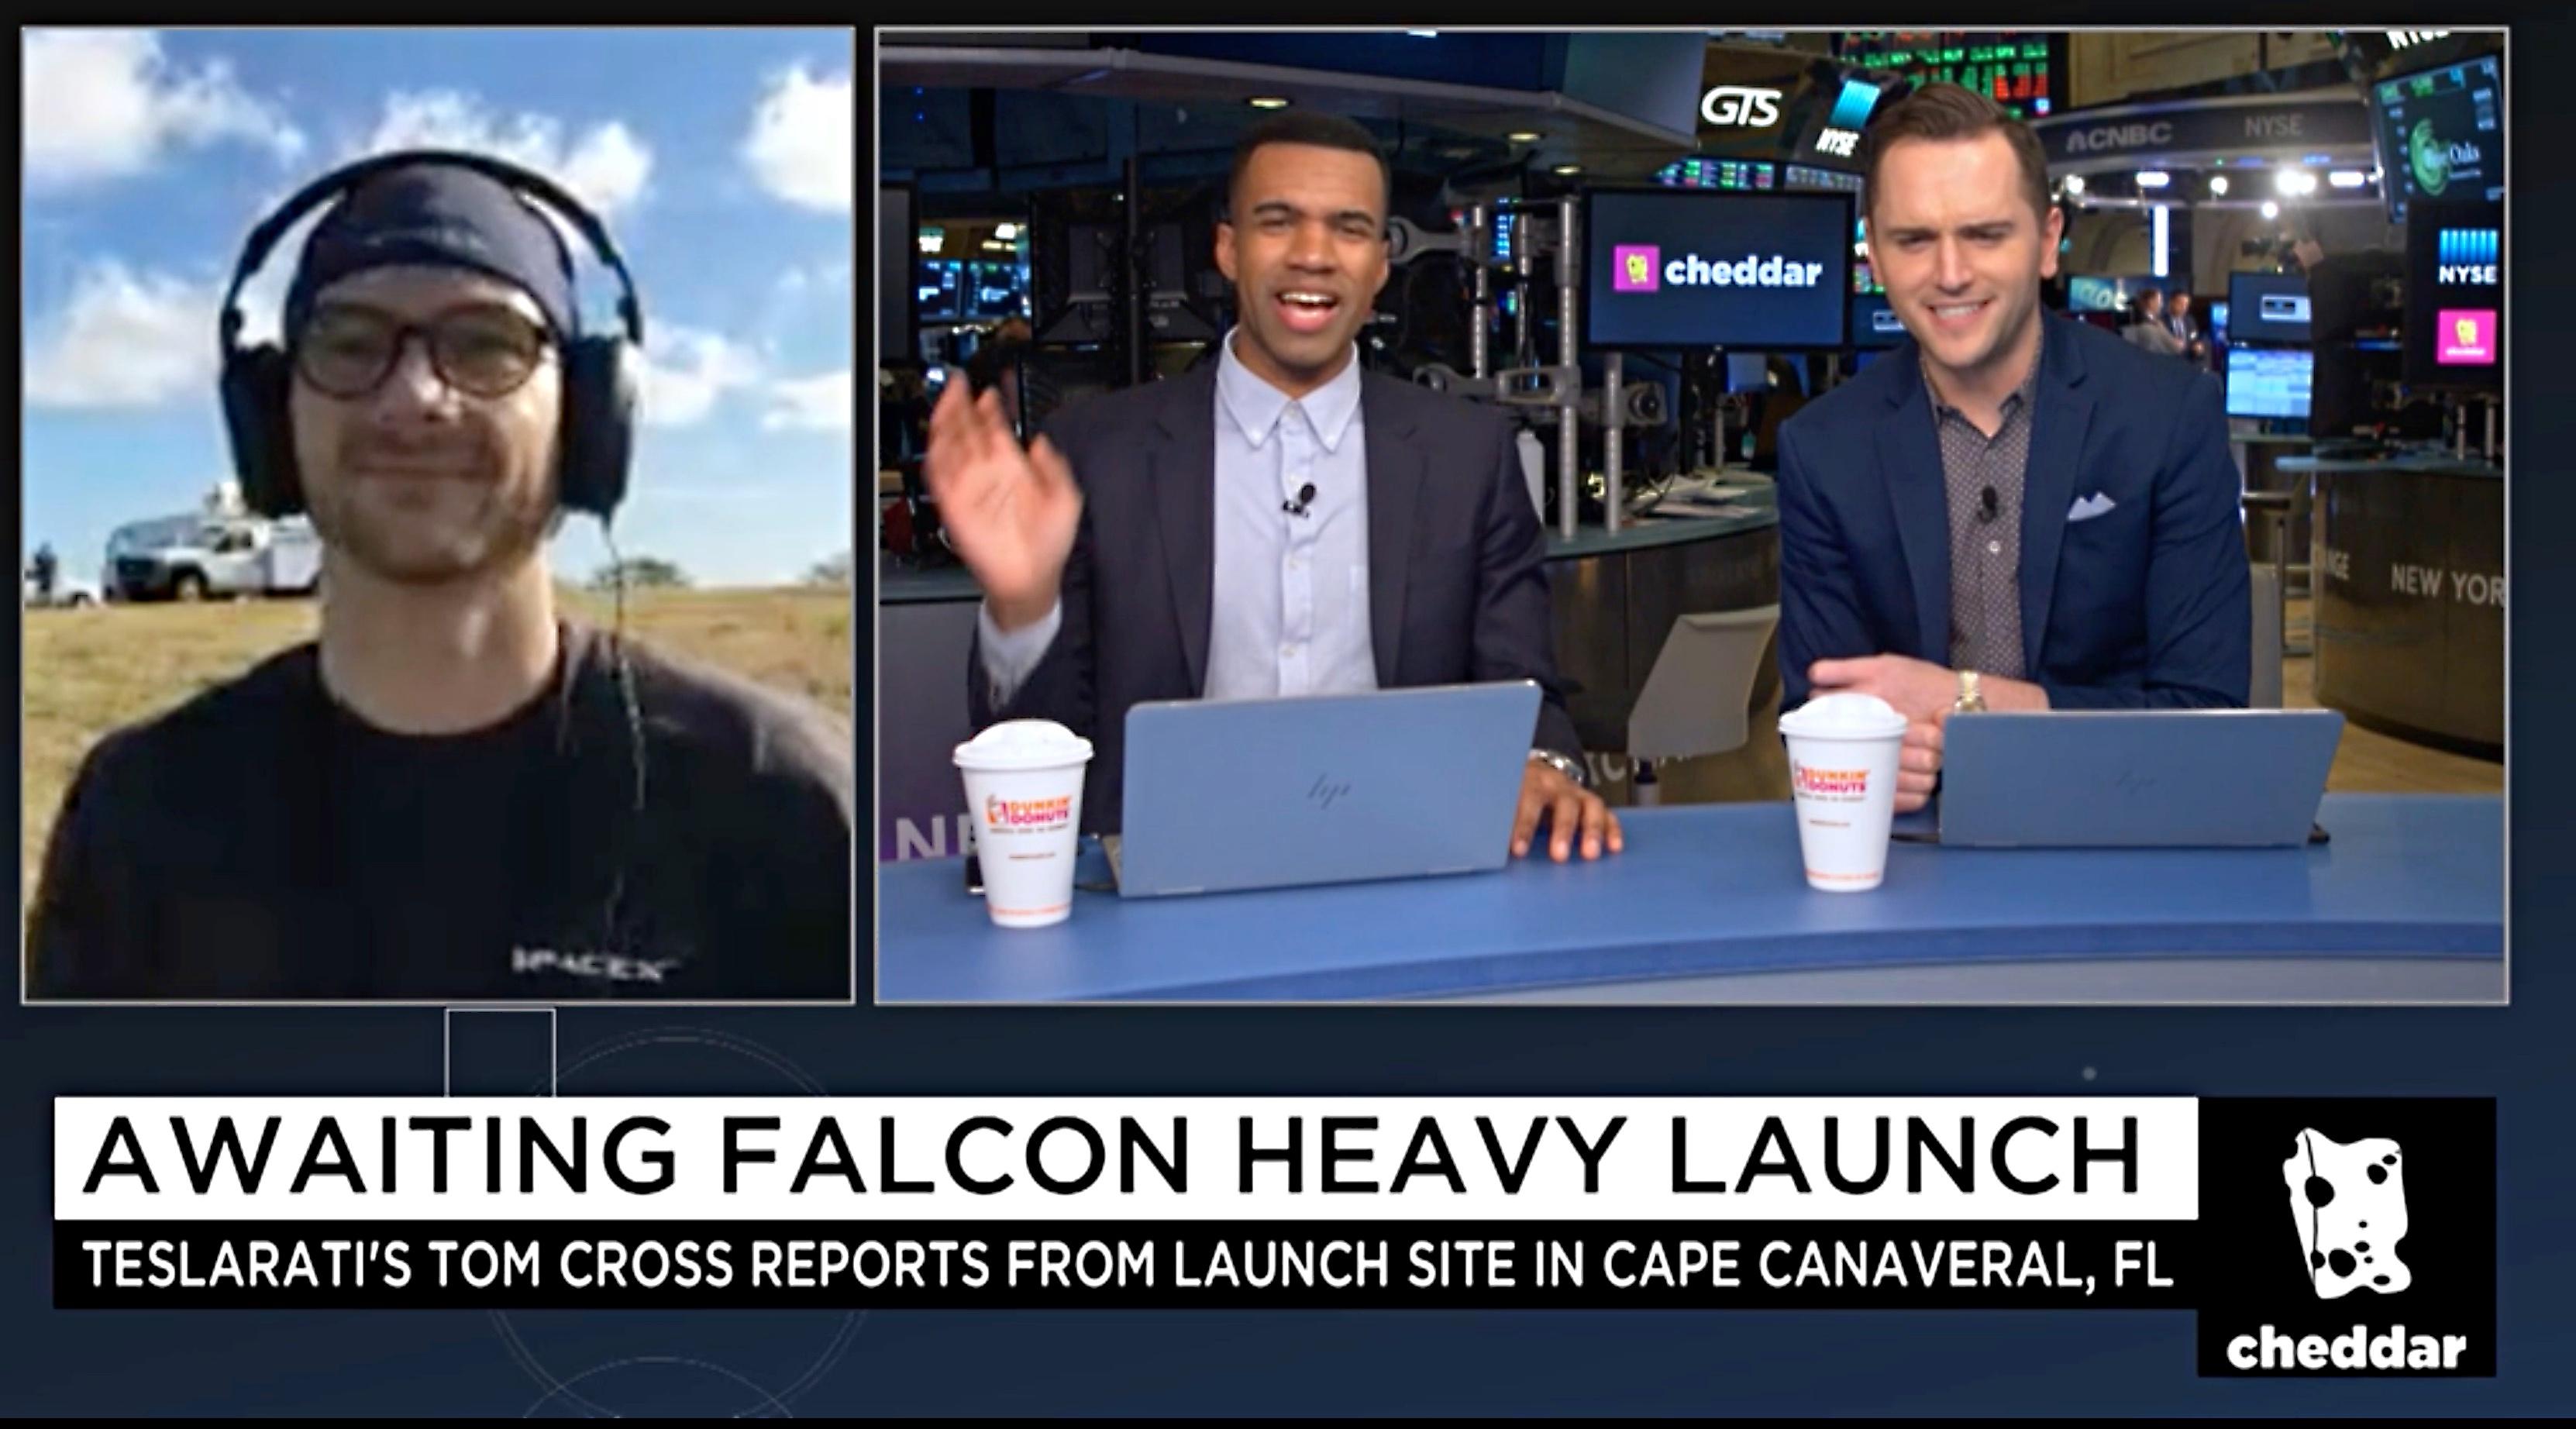 cheddar-tom-cross-spacex-falcon-heavy-launch